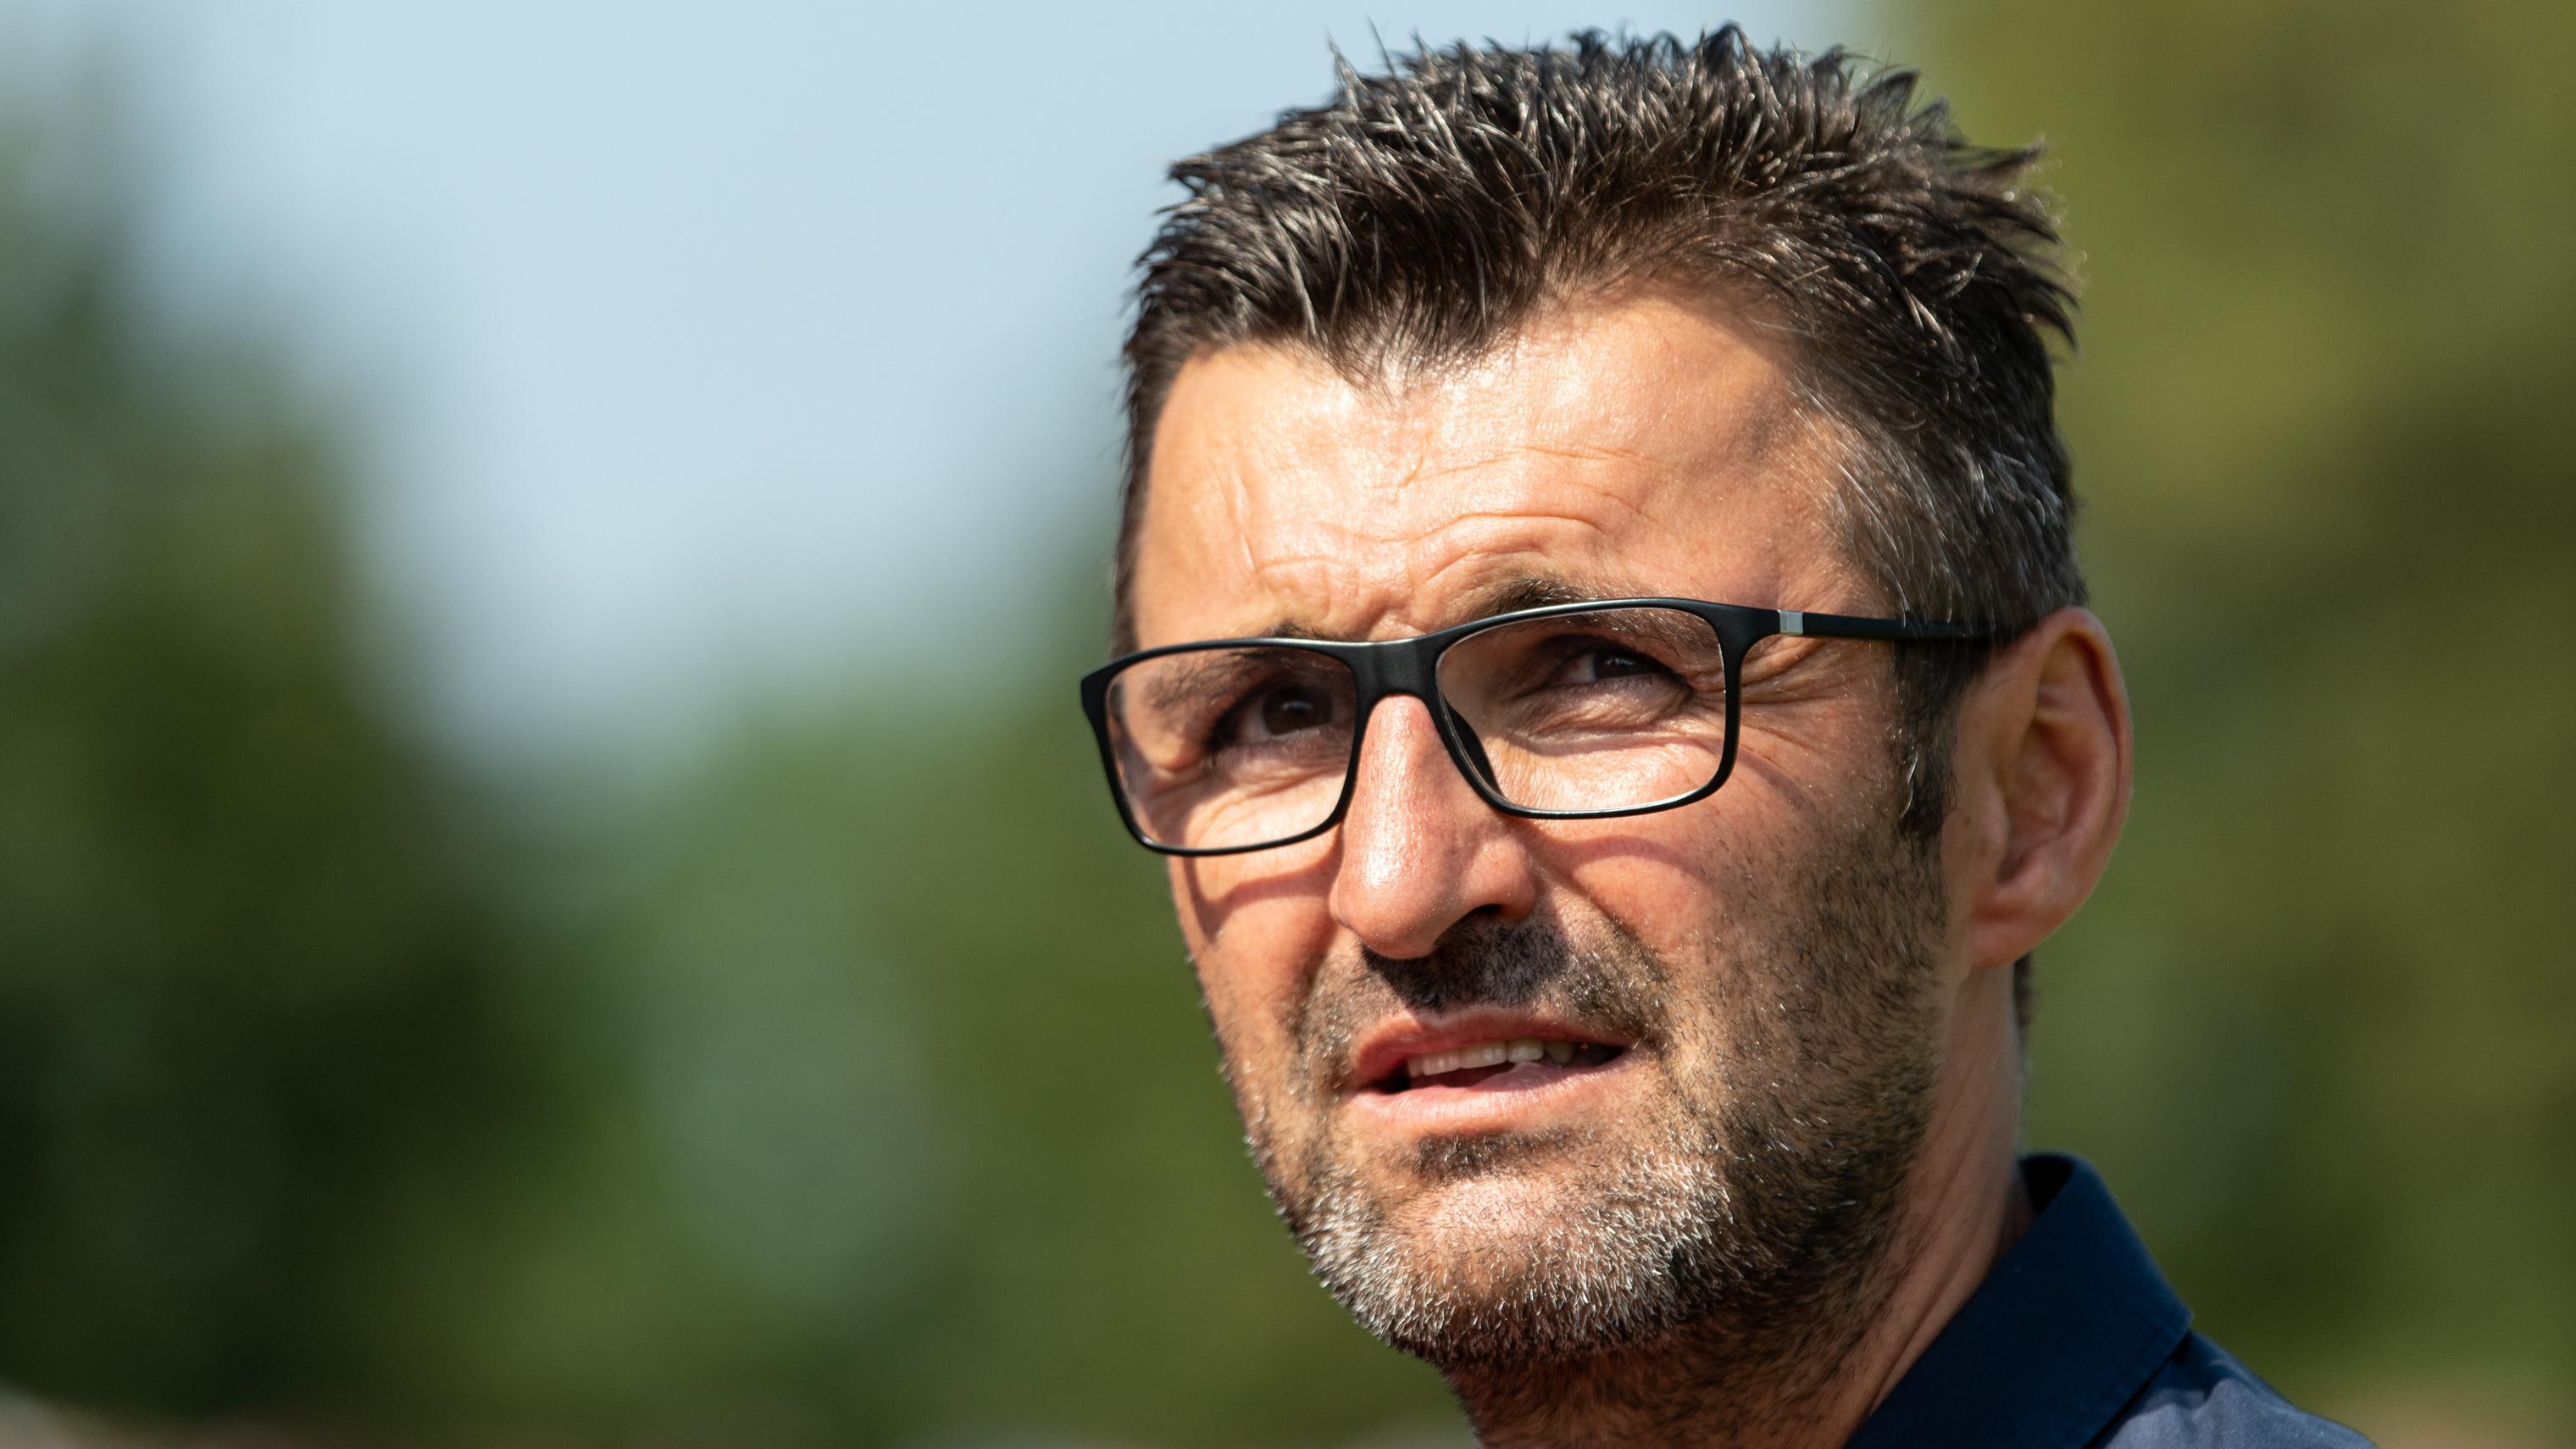 Club-Trainer Michael Köllner